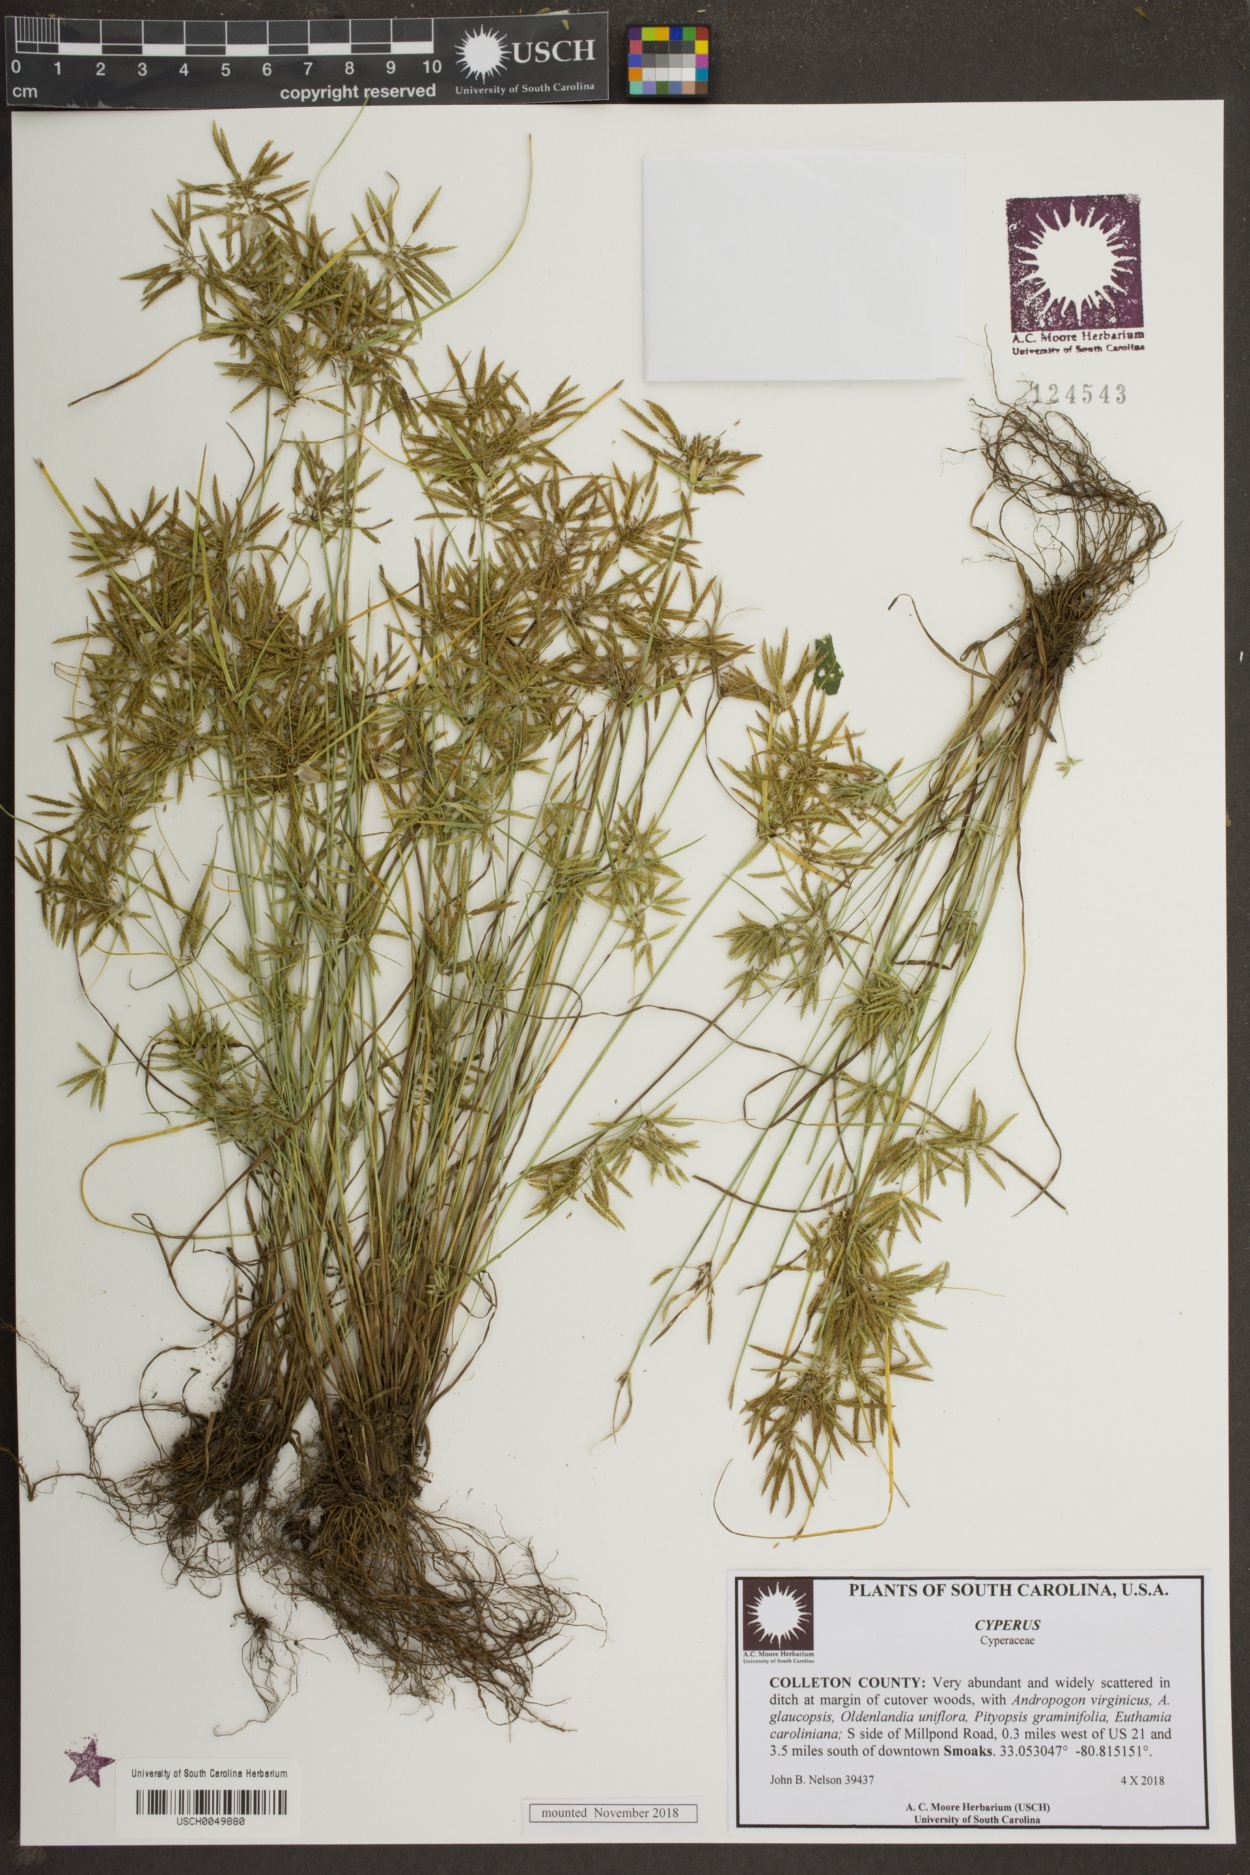 Cyperus image